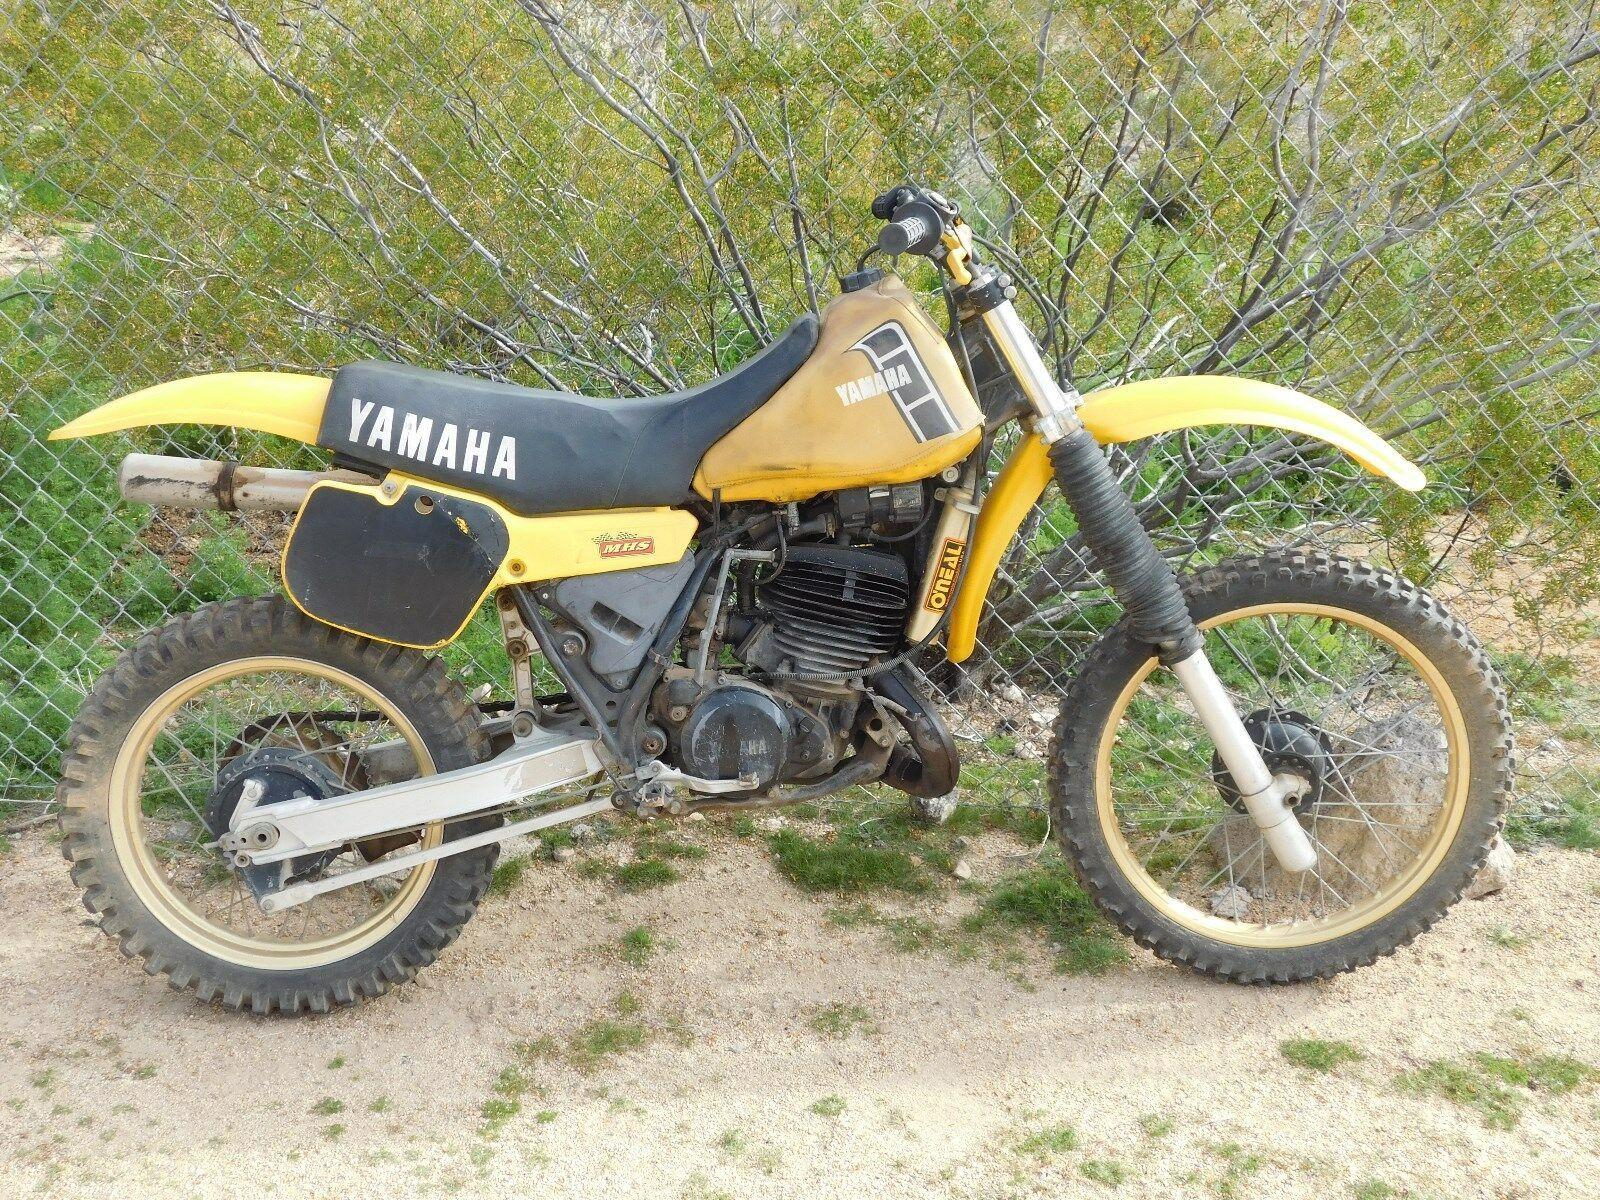 Yamaha It 490 Wikipedia - Car View Specs